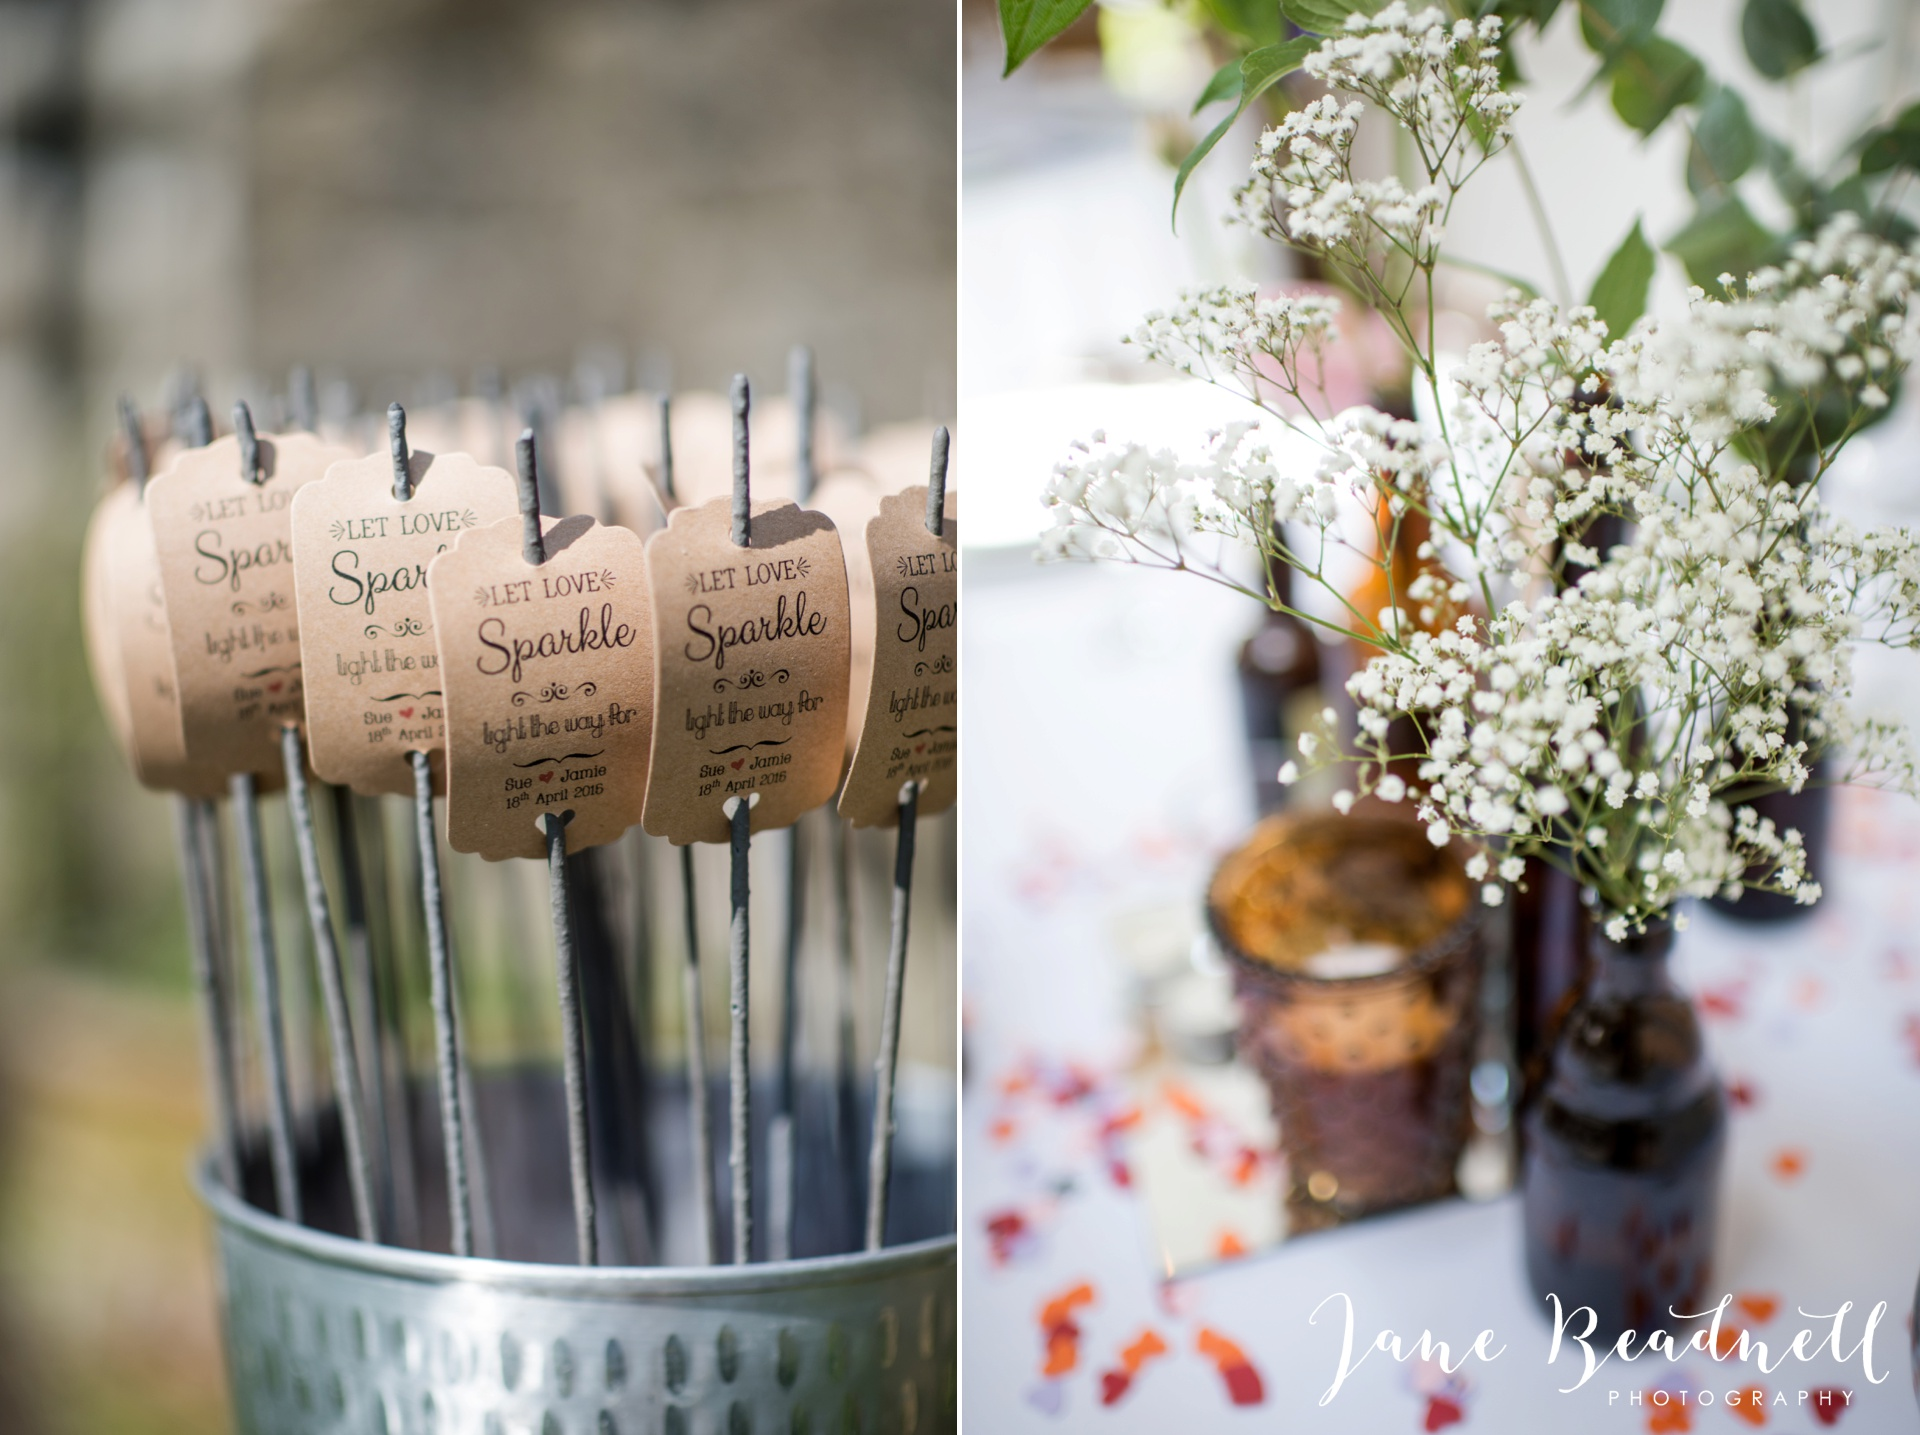 Jane Beadnell fine art wedding photographer The Cheerful Chilli Barn Otley_0045